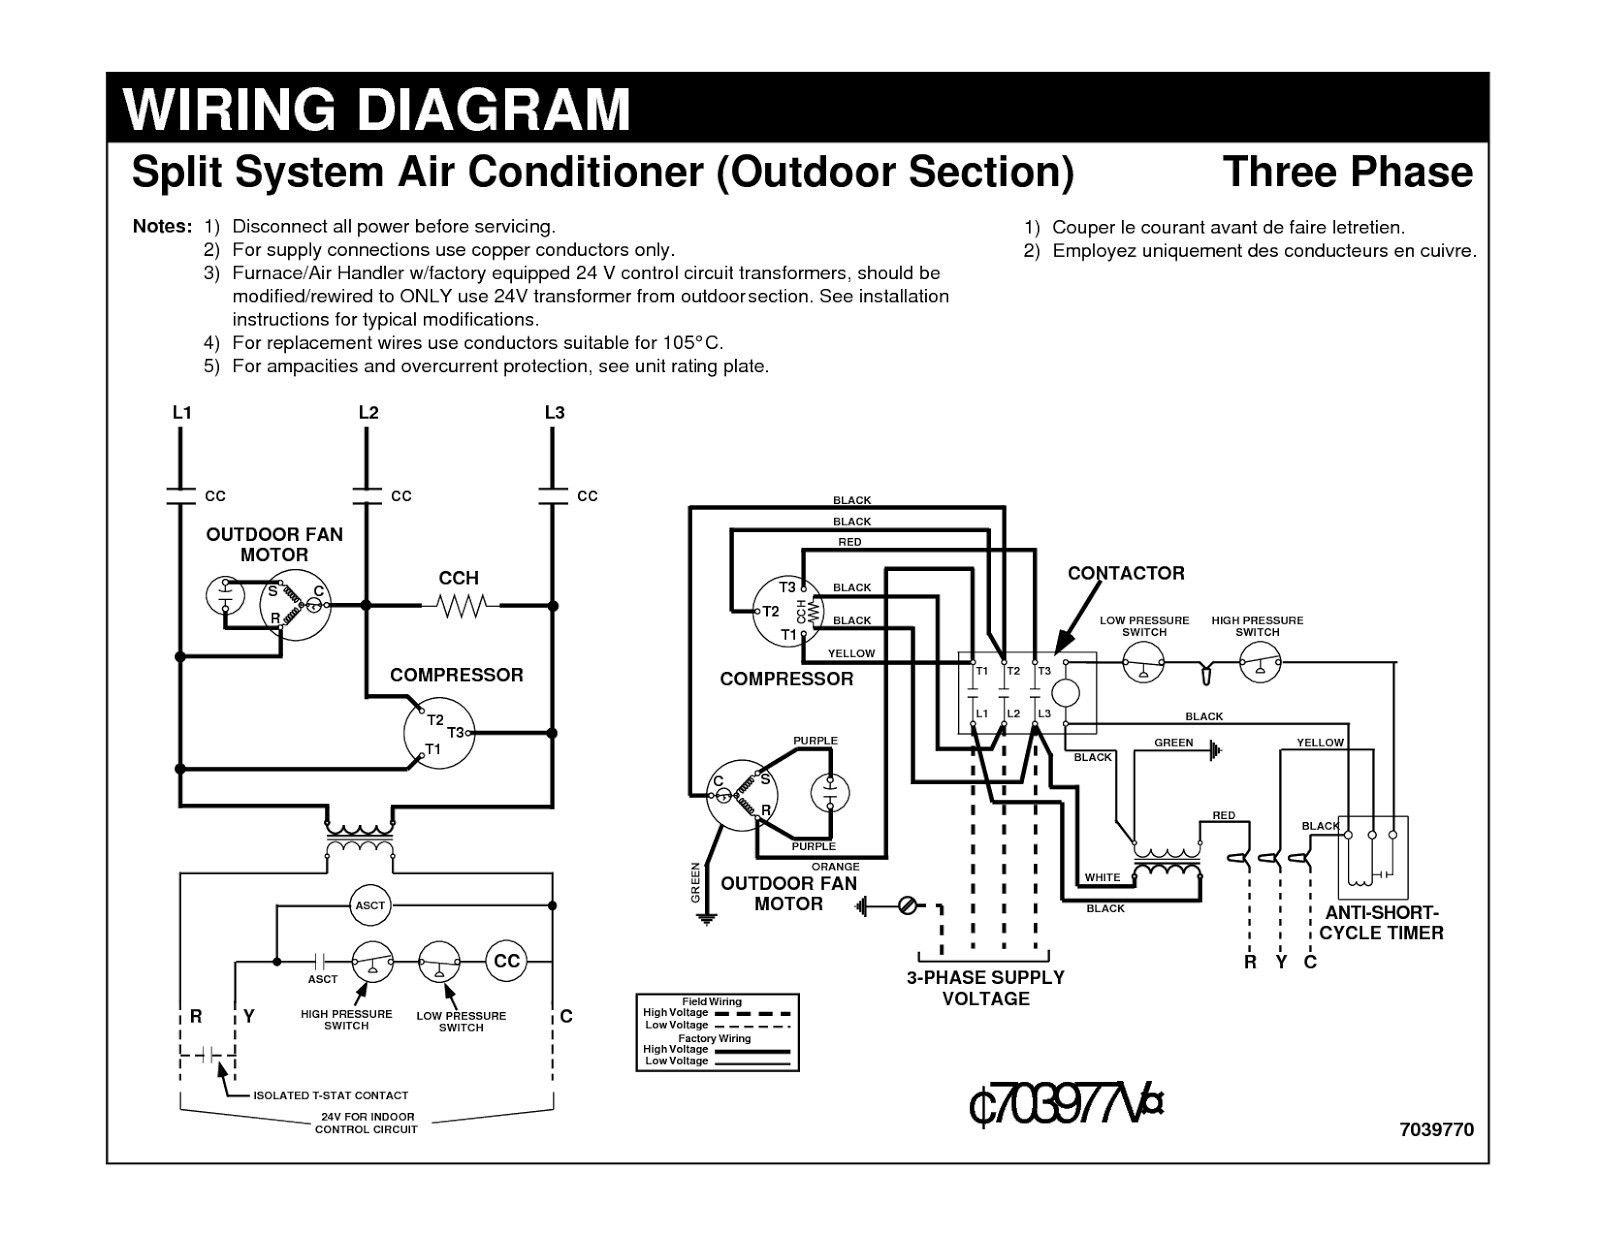 New Hvac Wiring Diagram Test Questions Diagram